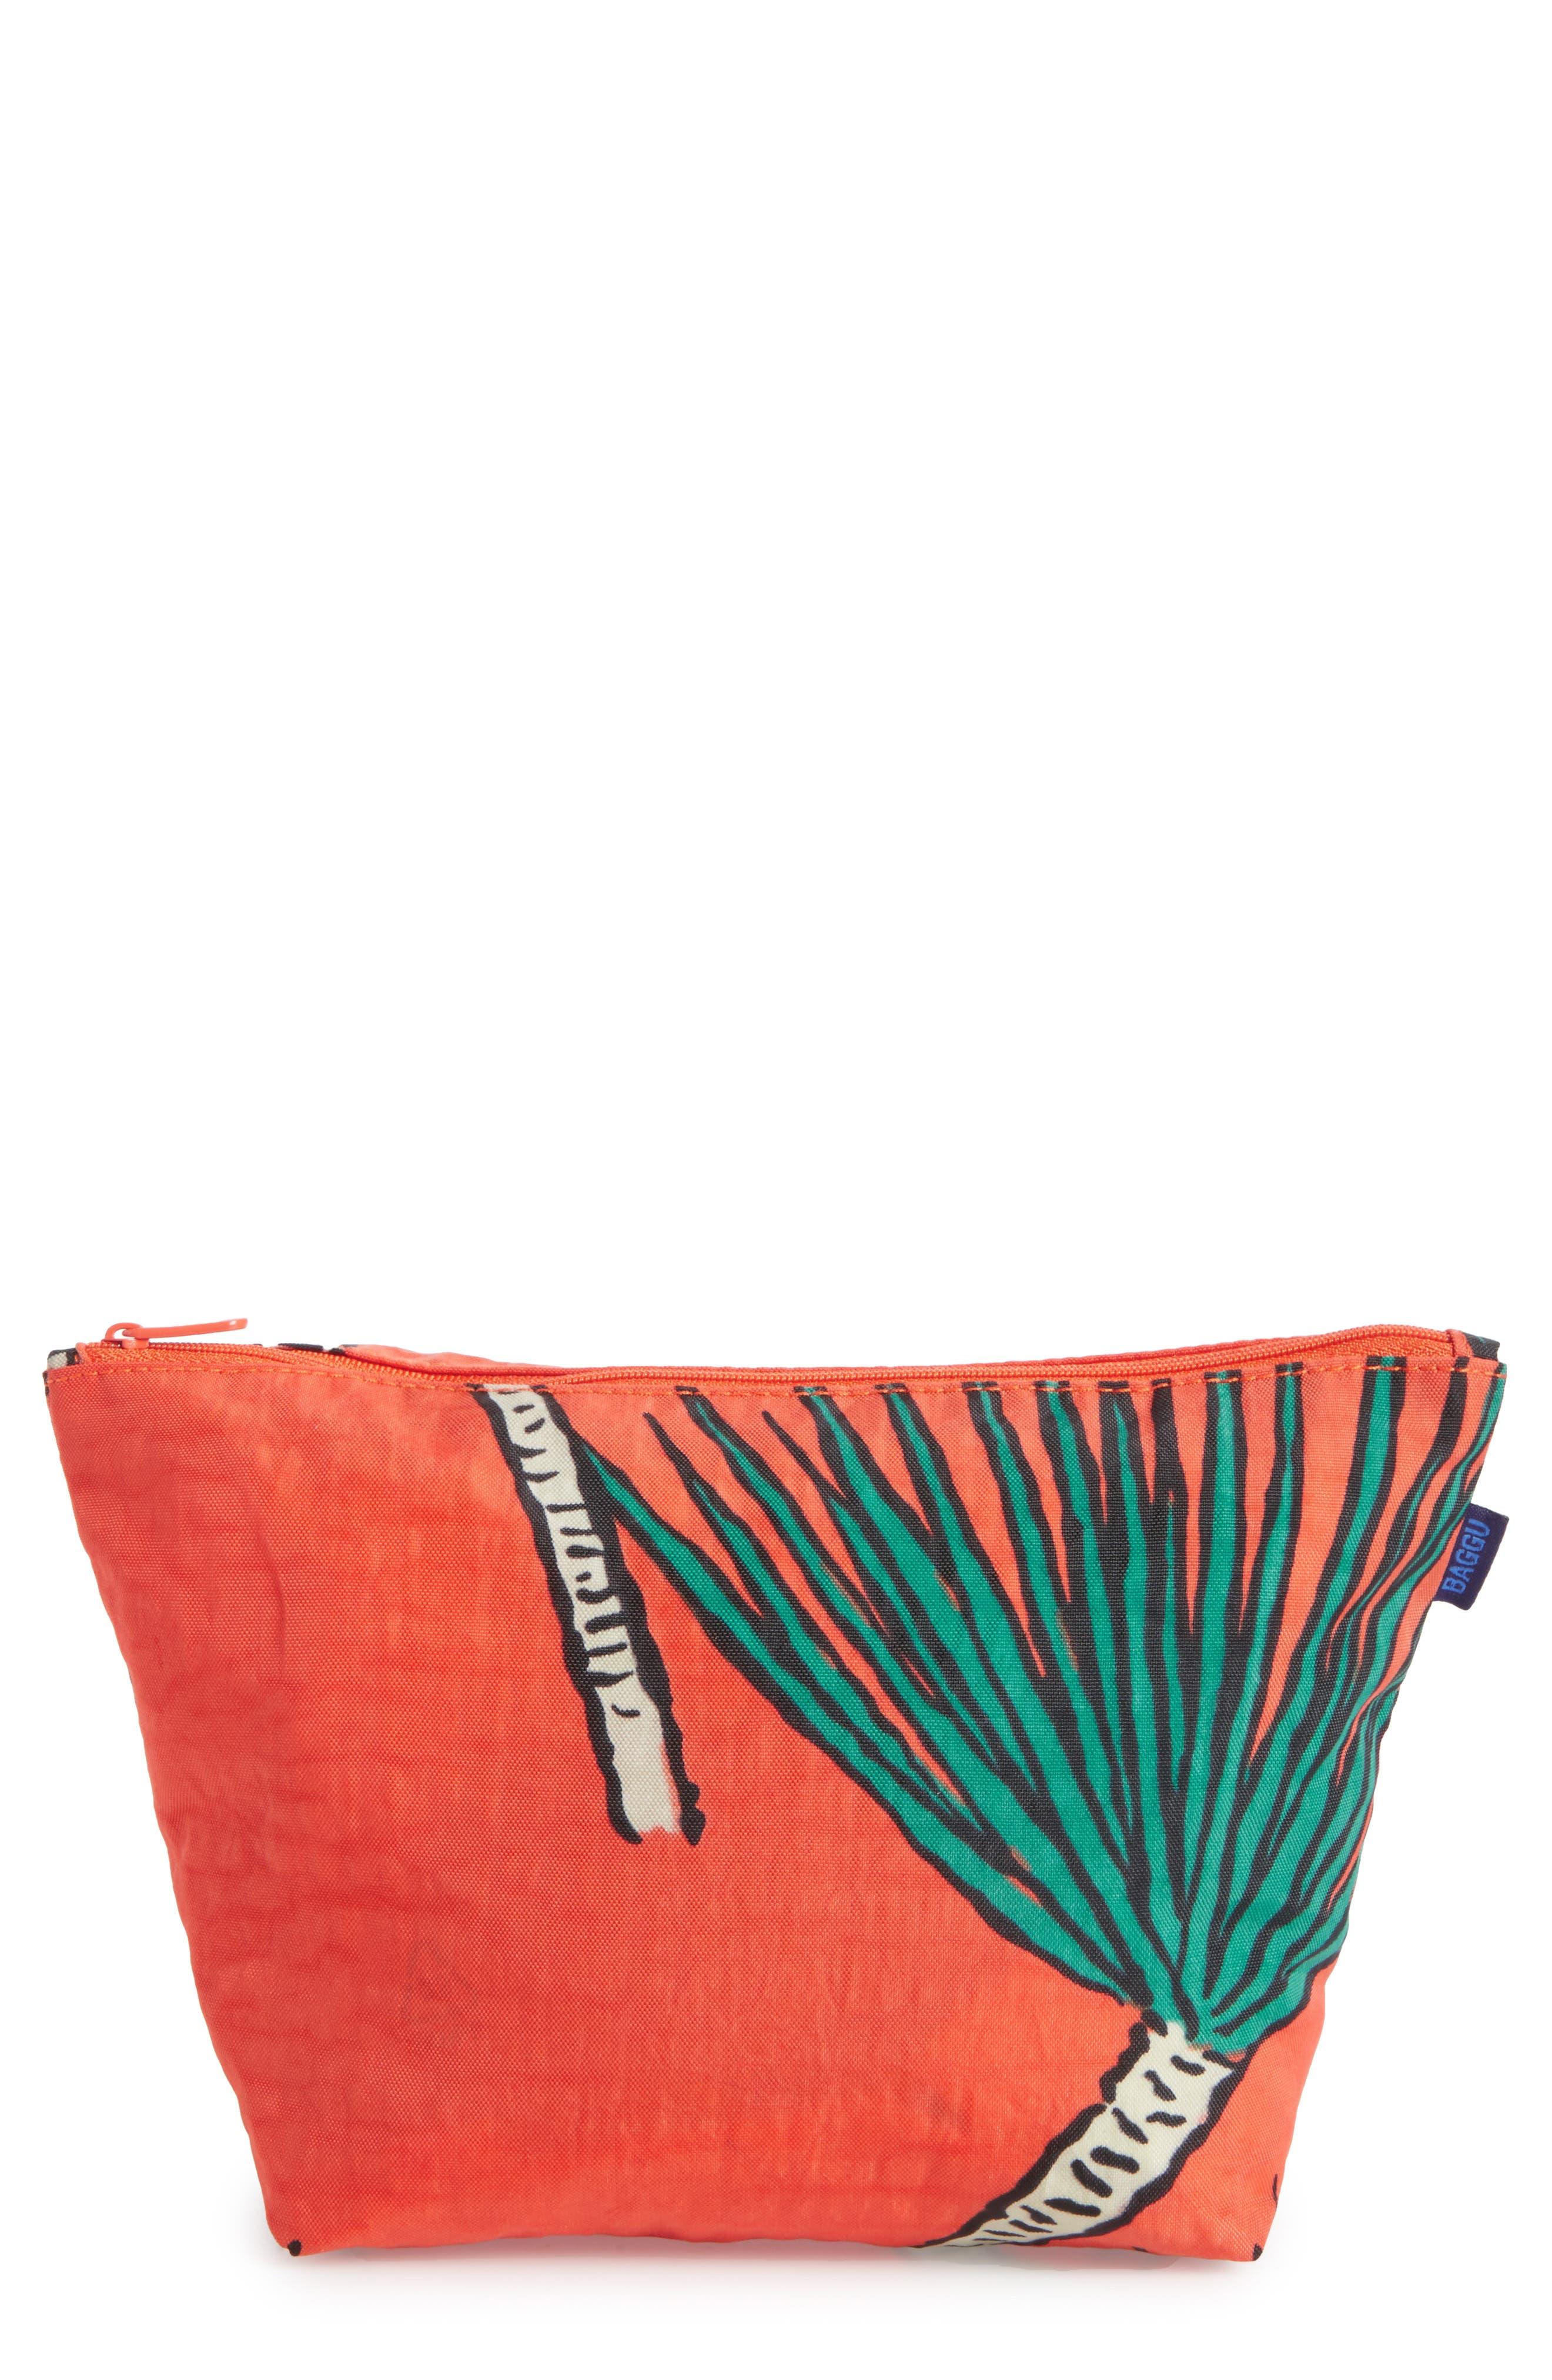 Medium Carry All Nylon Pouch,                             Main thumbnail 1, color,                             Dragon Tree